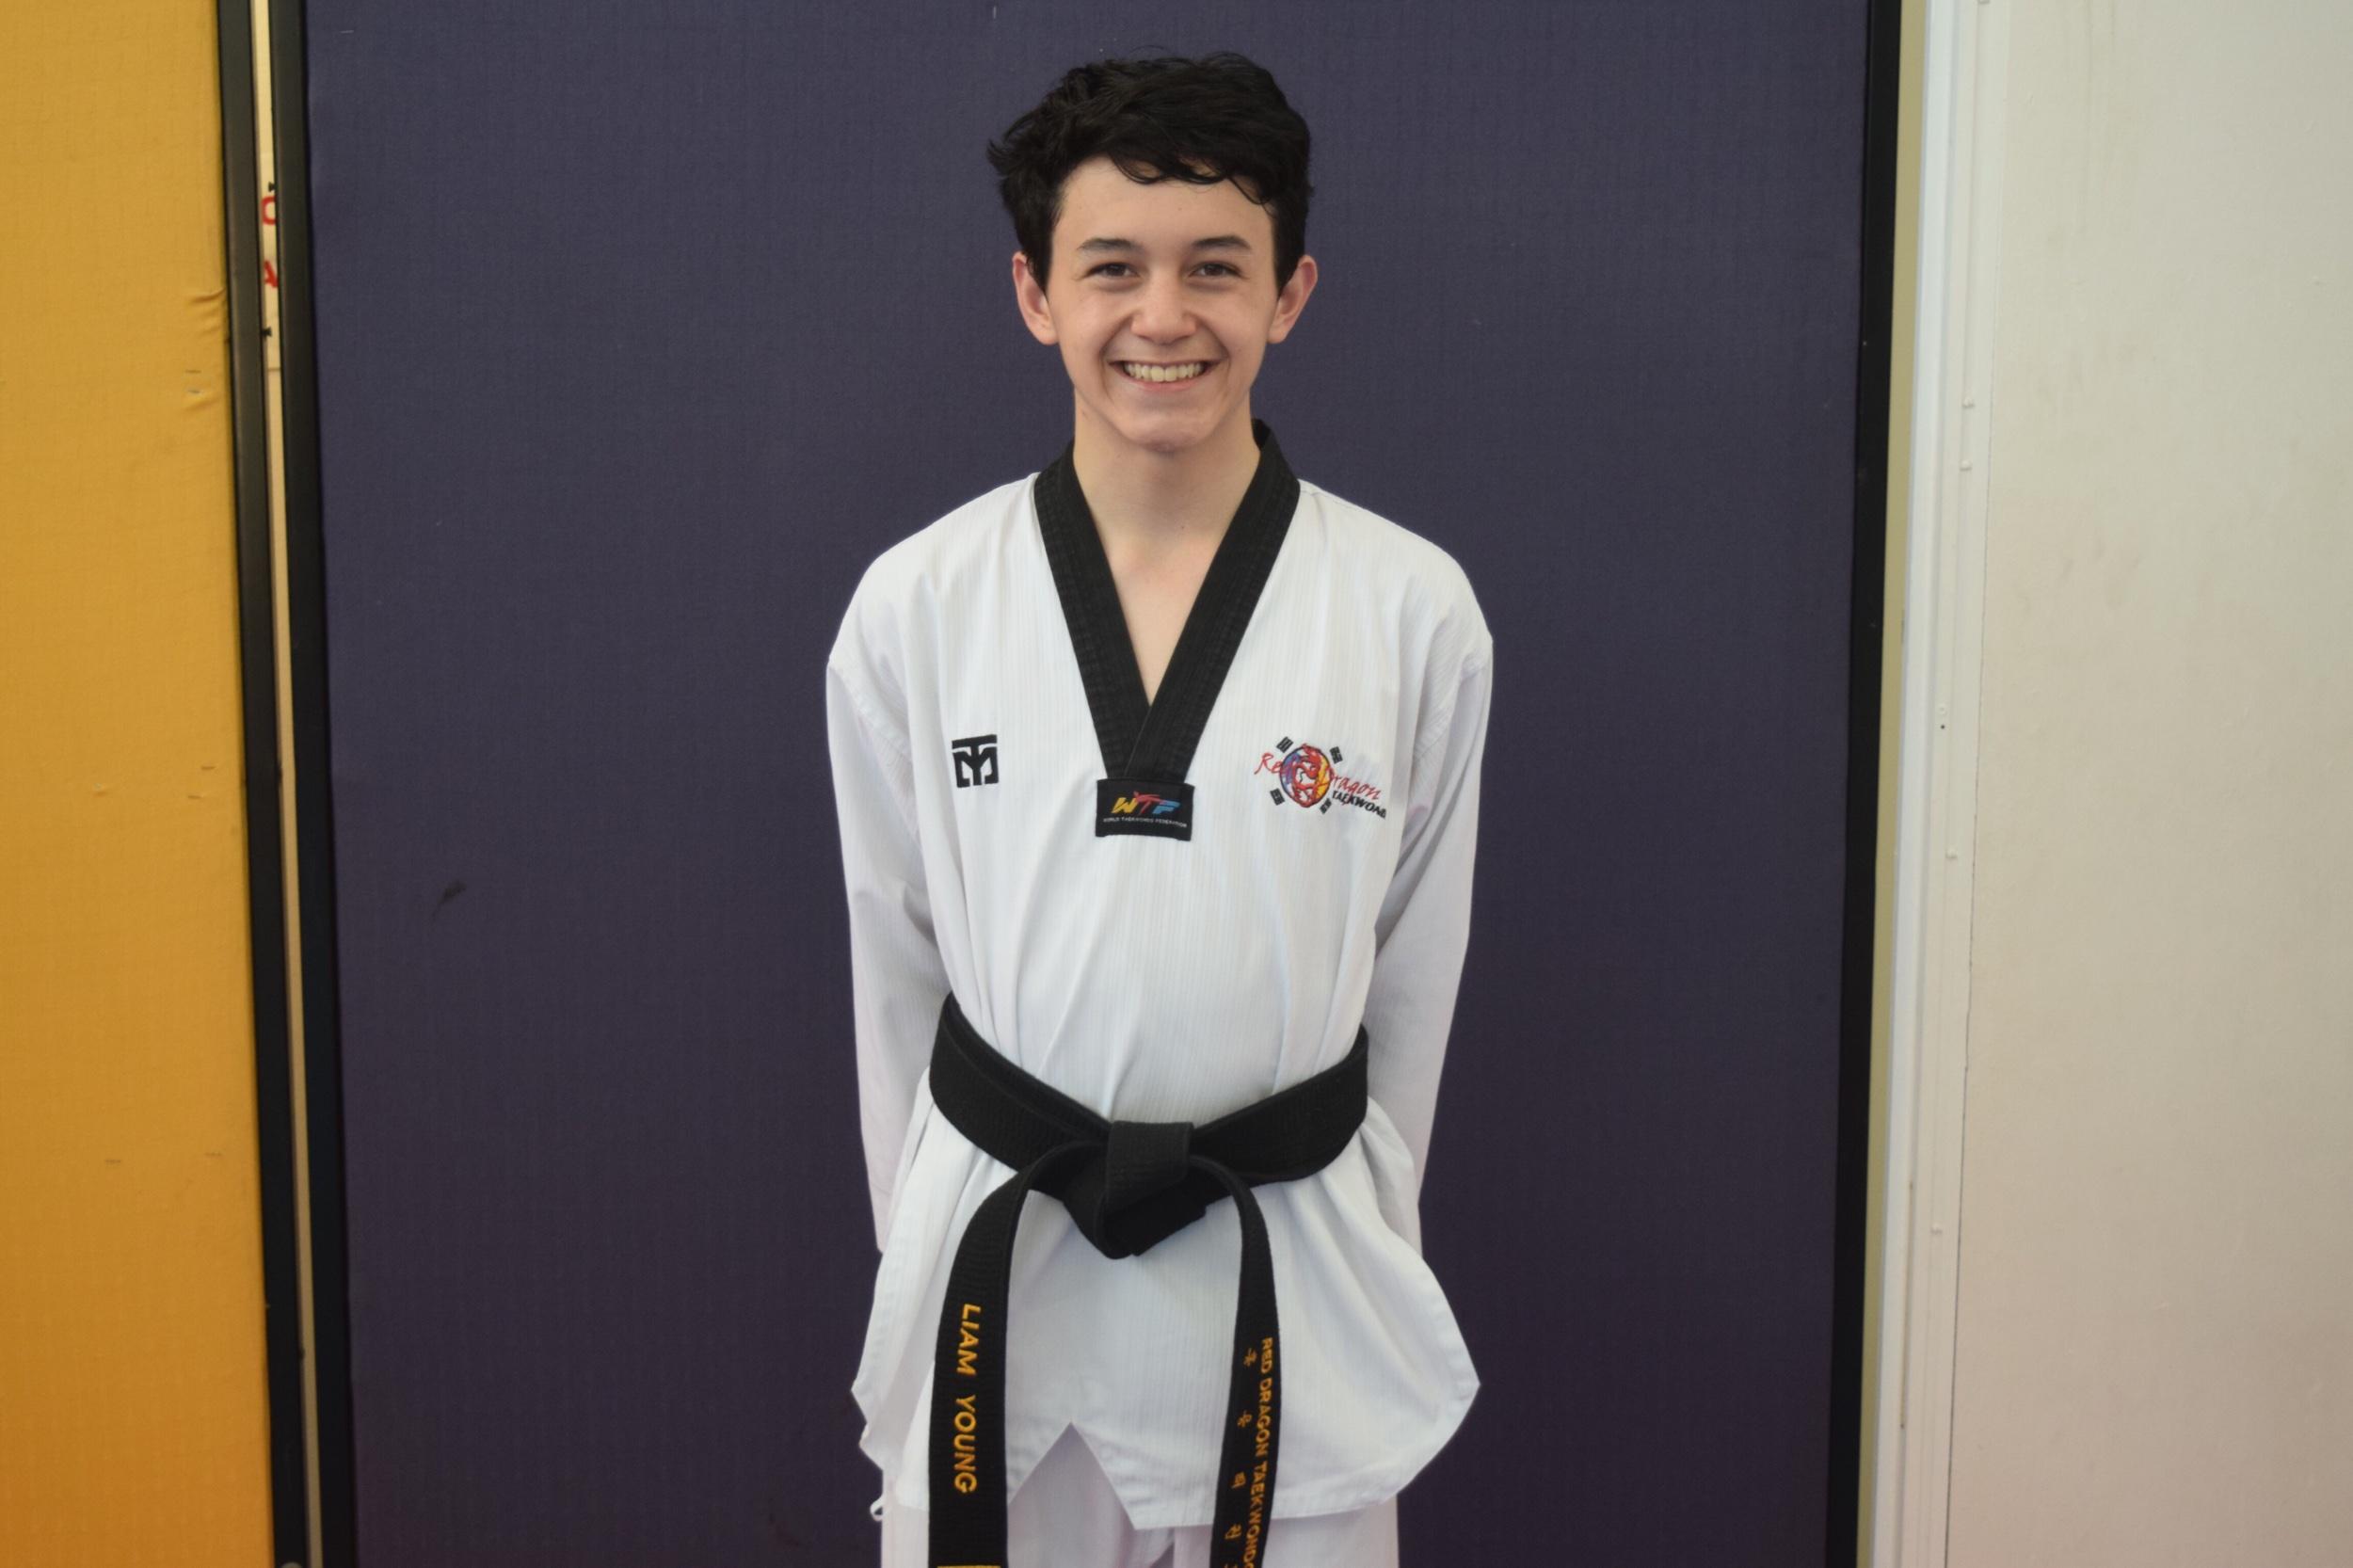 - Assistant instructorLiam youngsPecialiZations3rd dan black belt